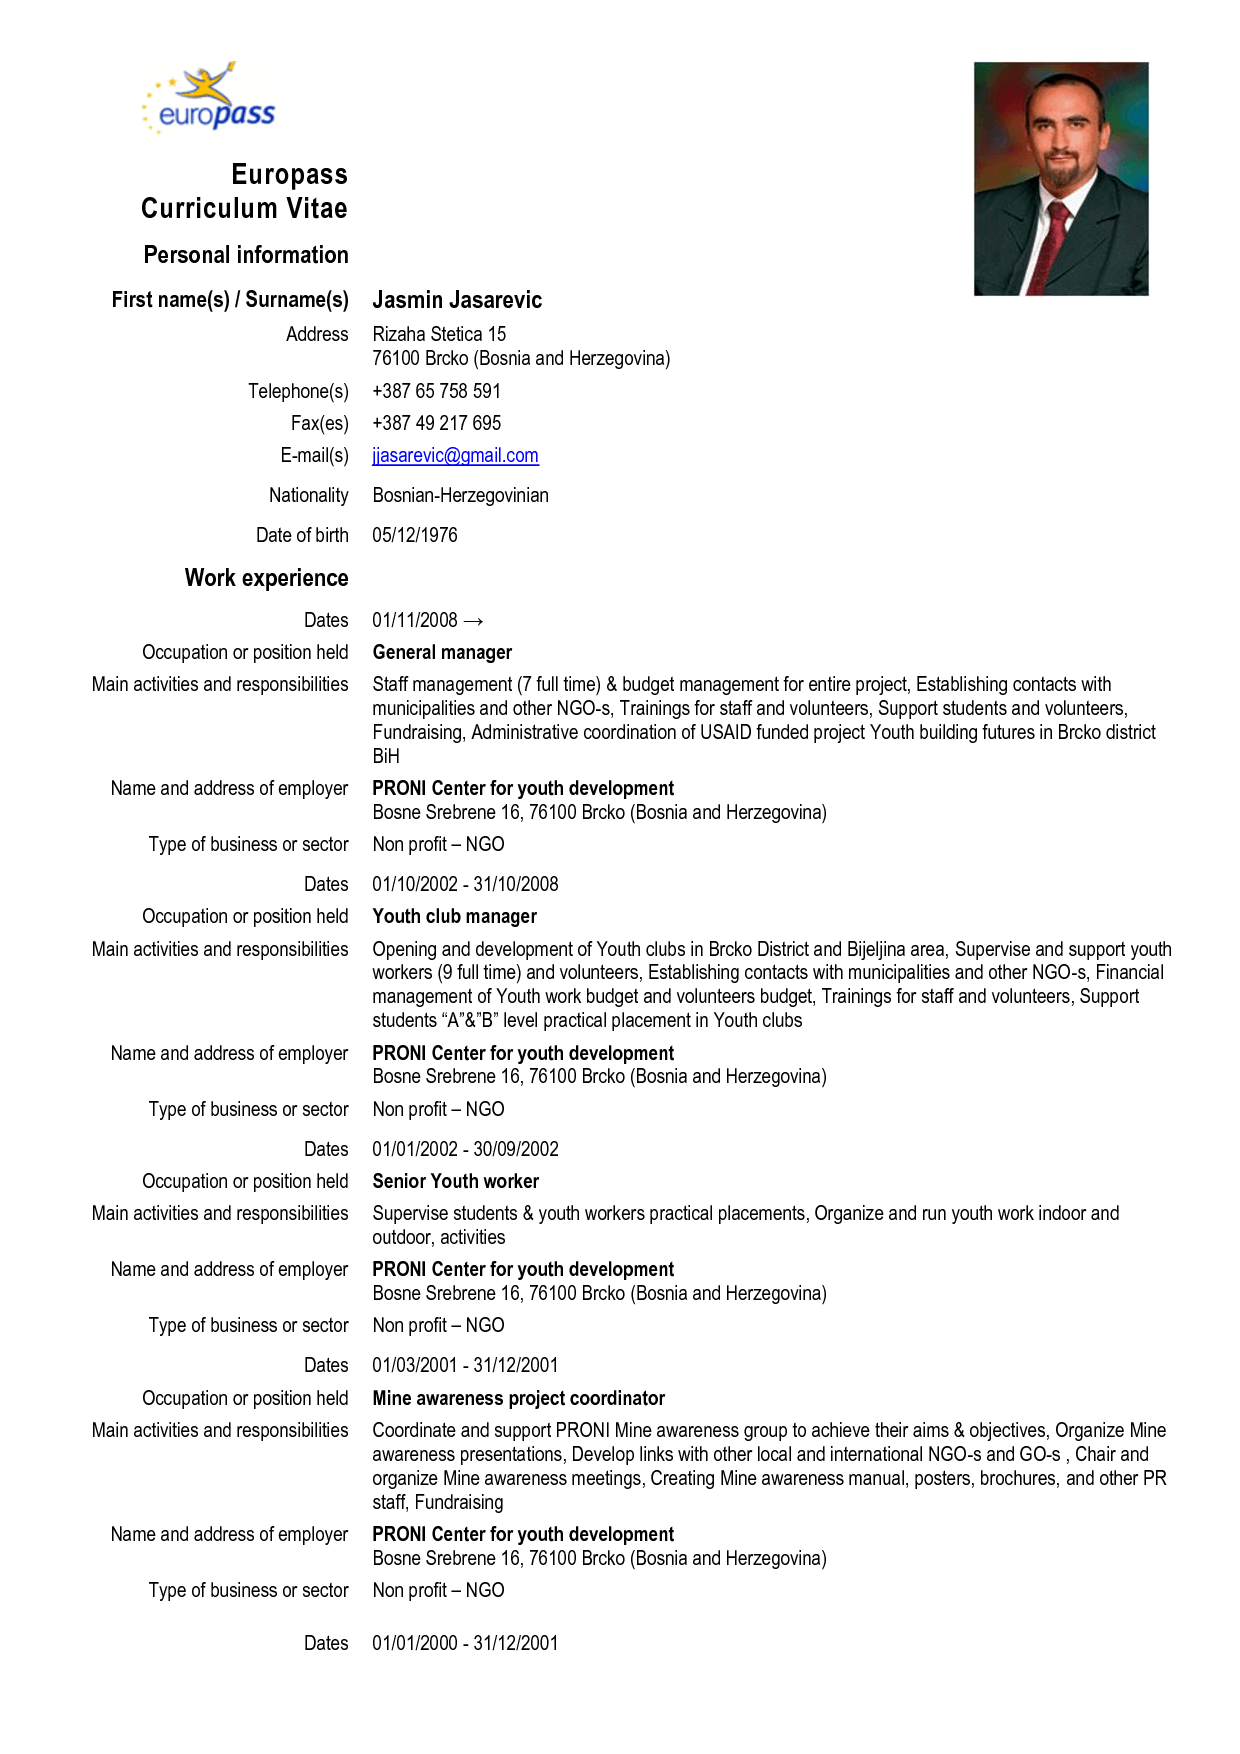 Free Resume Sample Curriculum vitae, Curriculum vitae